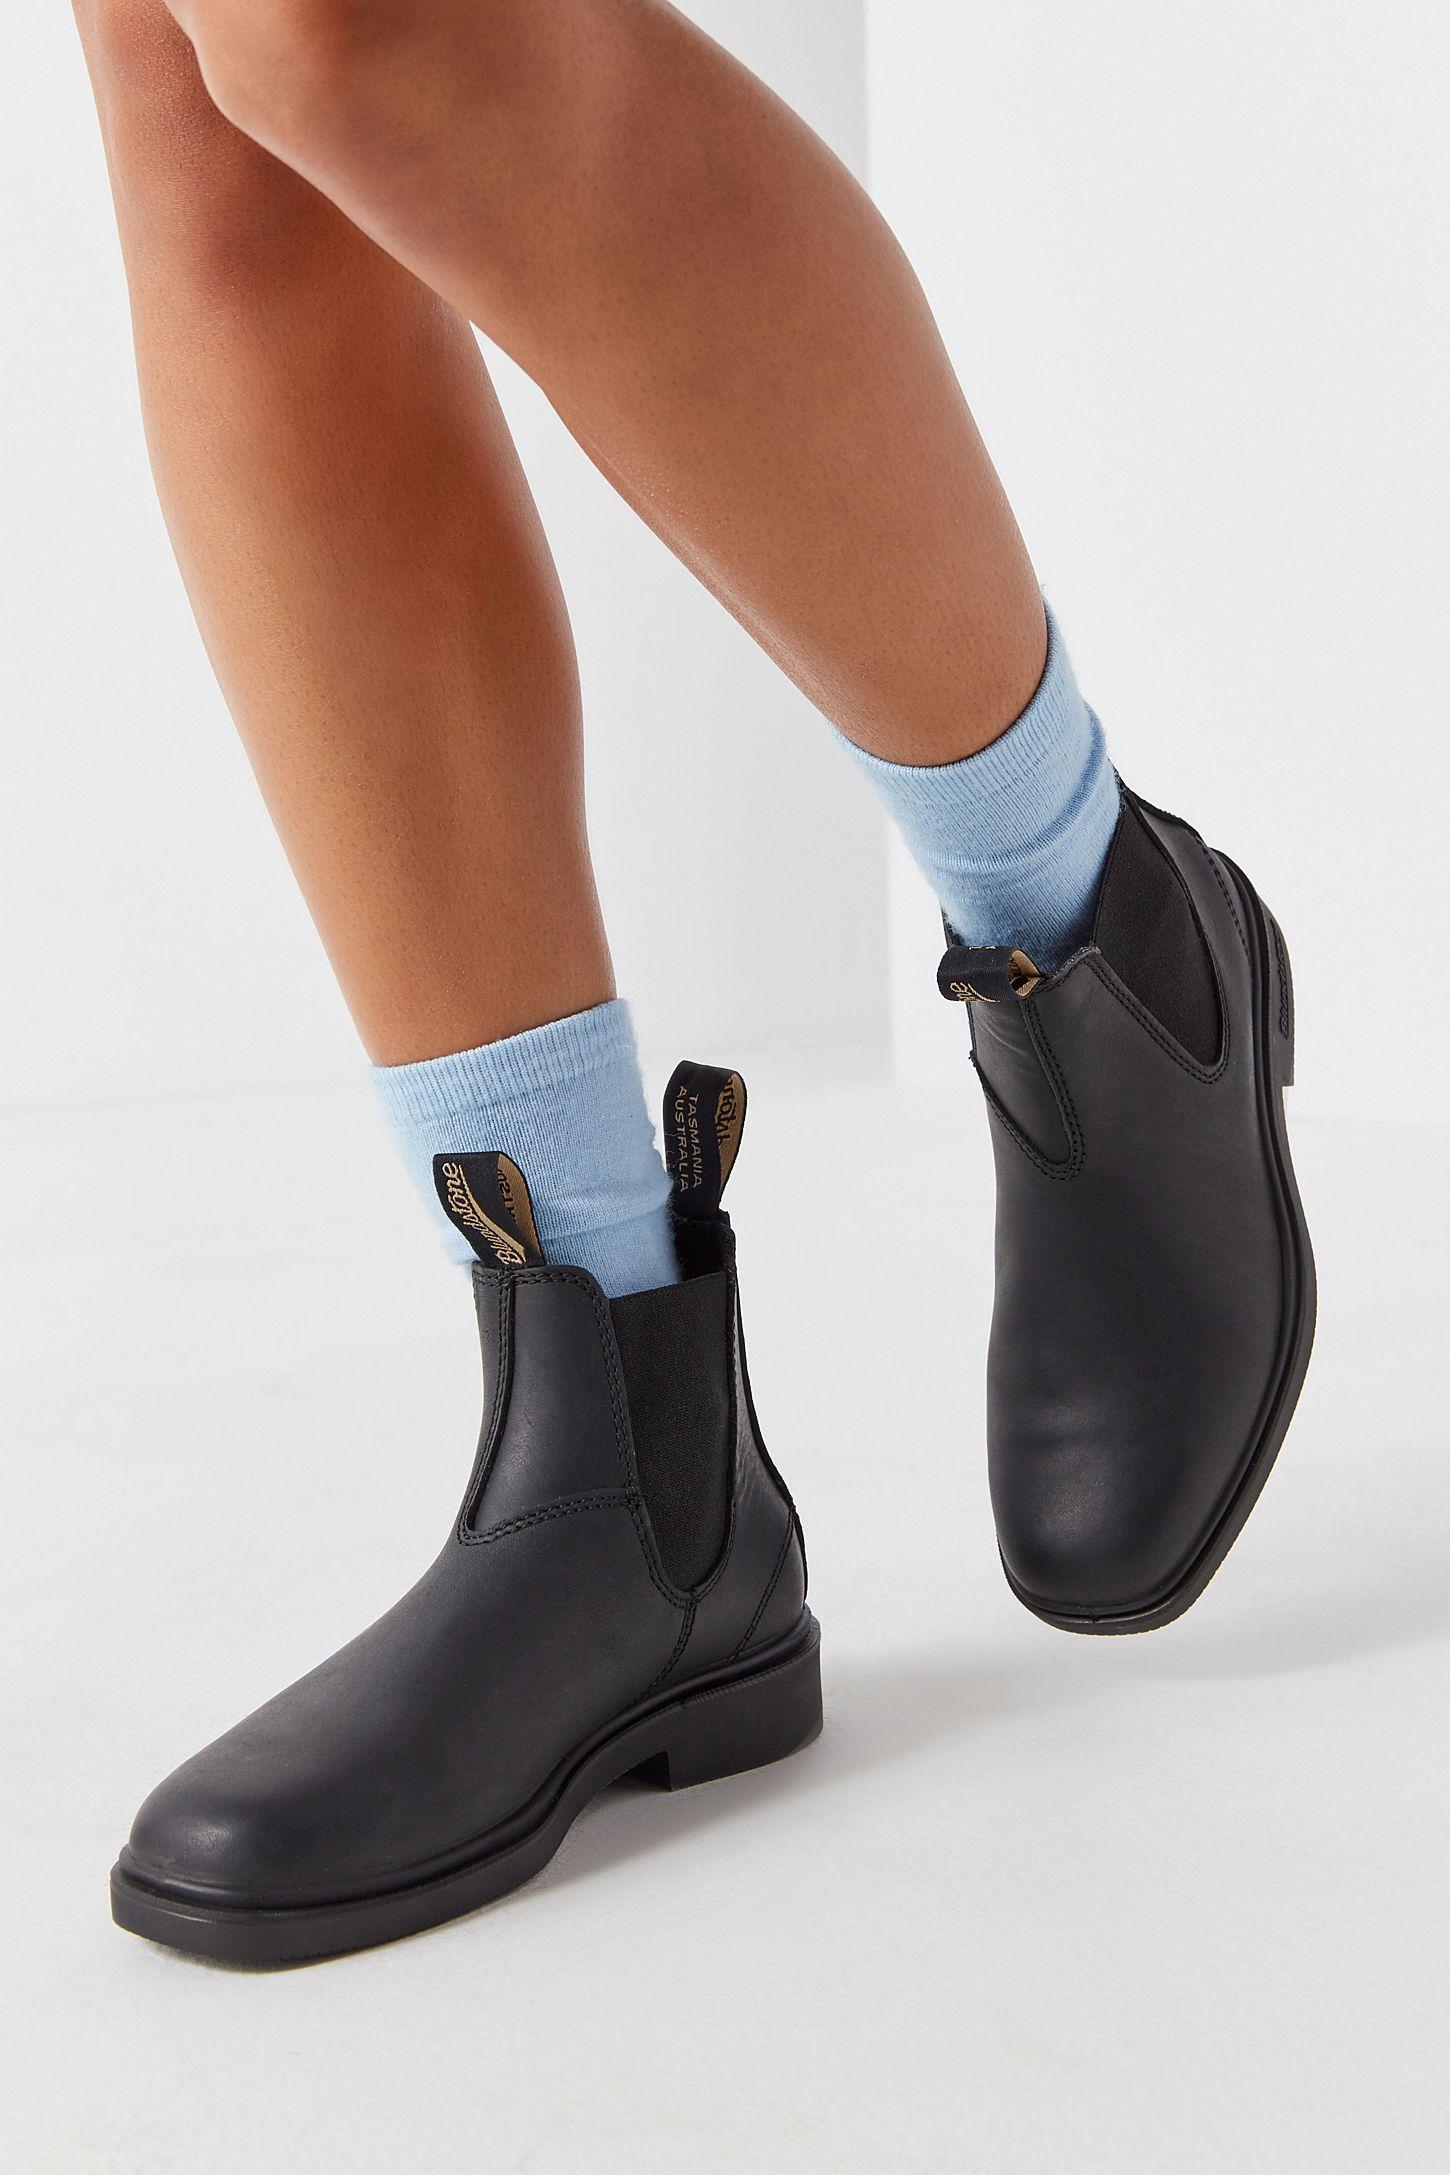 922d8f4adcb Blundstone 068 Chisel Toe Chelsea Boot